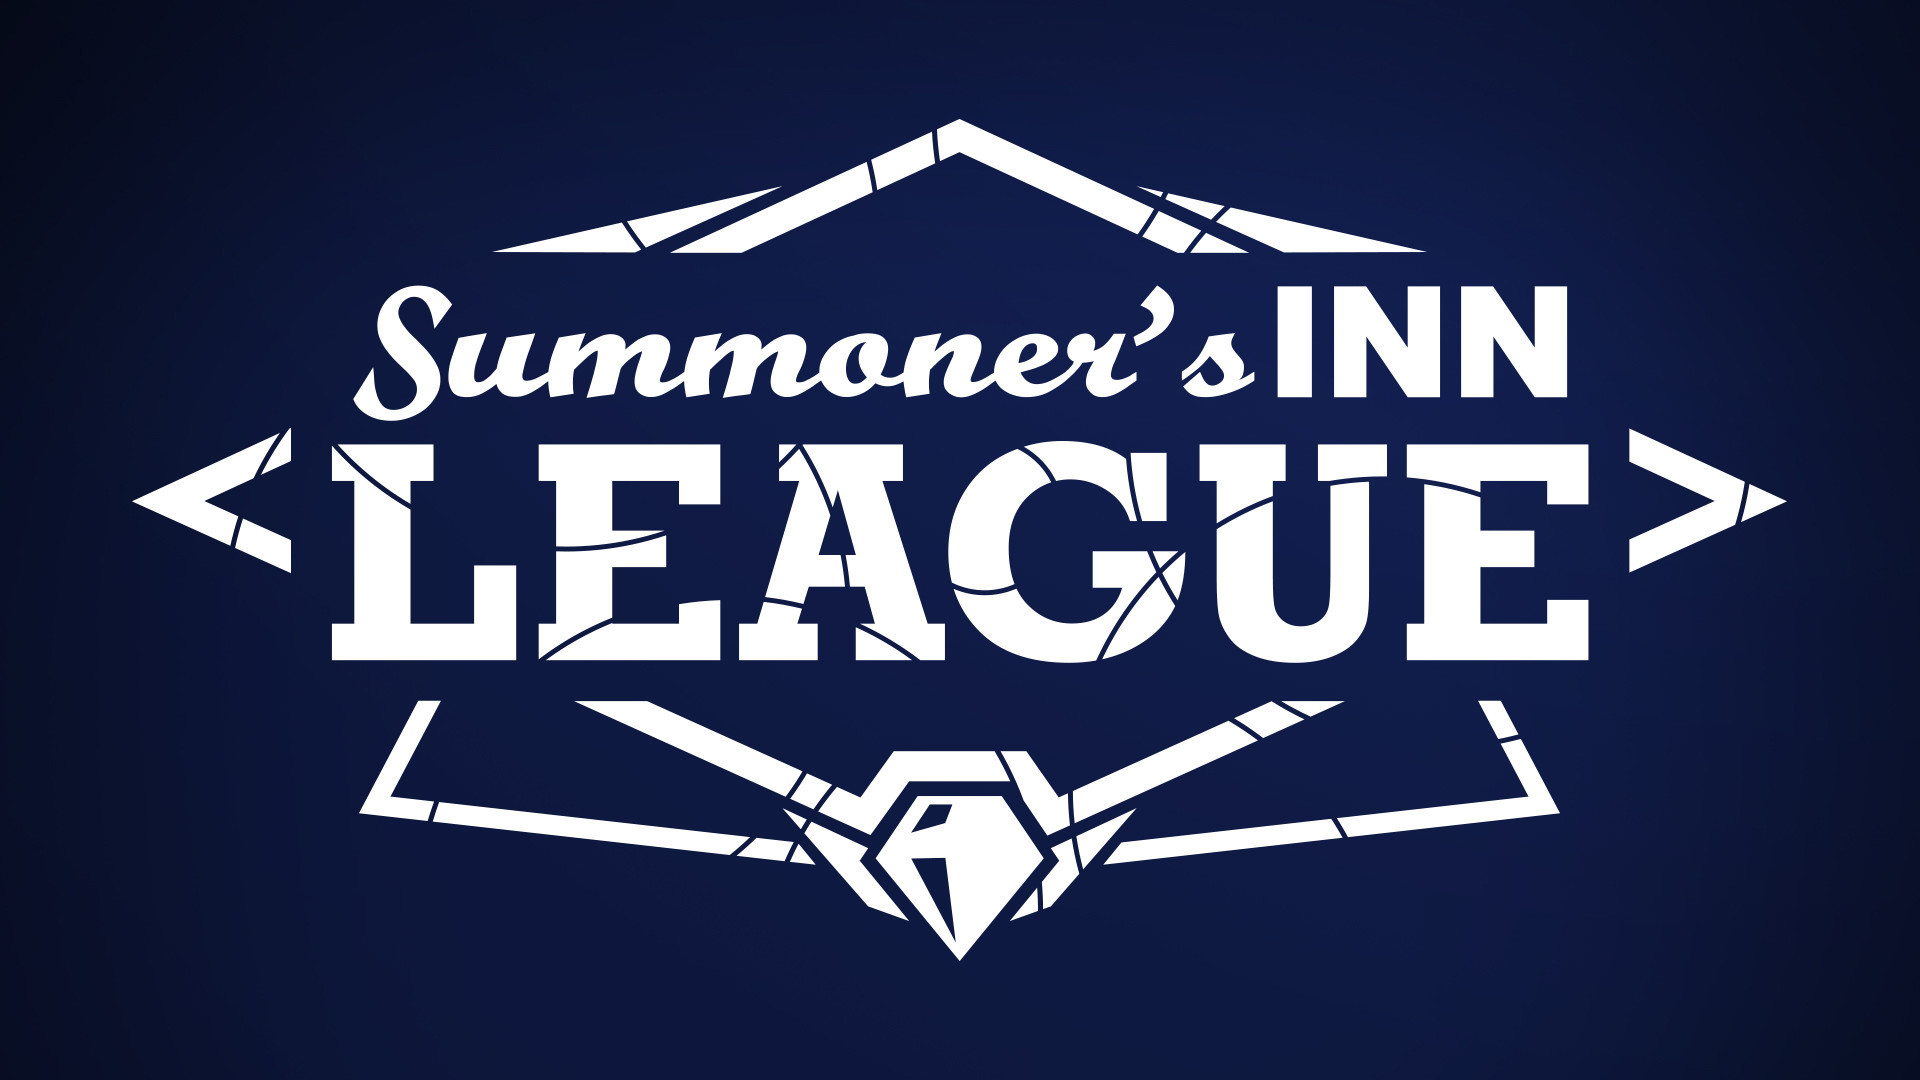 SINN League Division 2: Wer schafft den Aufstieg?